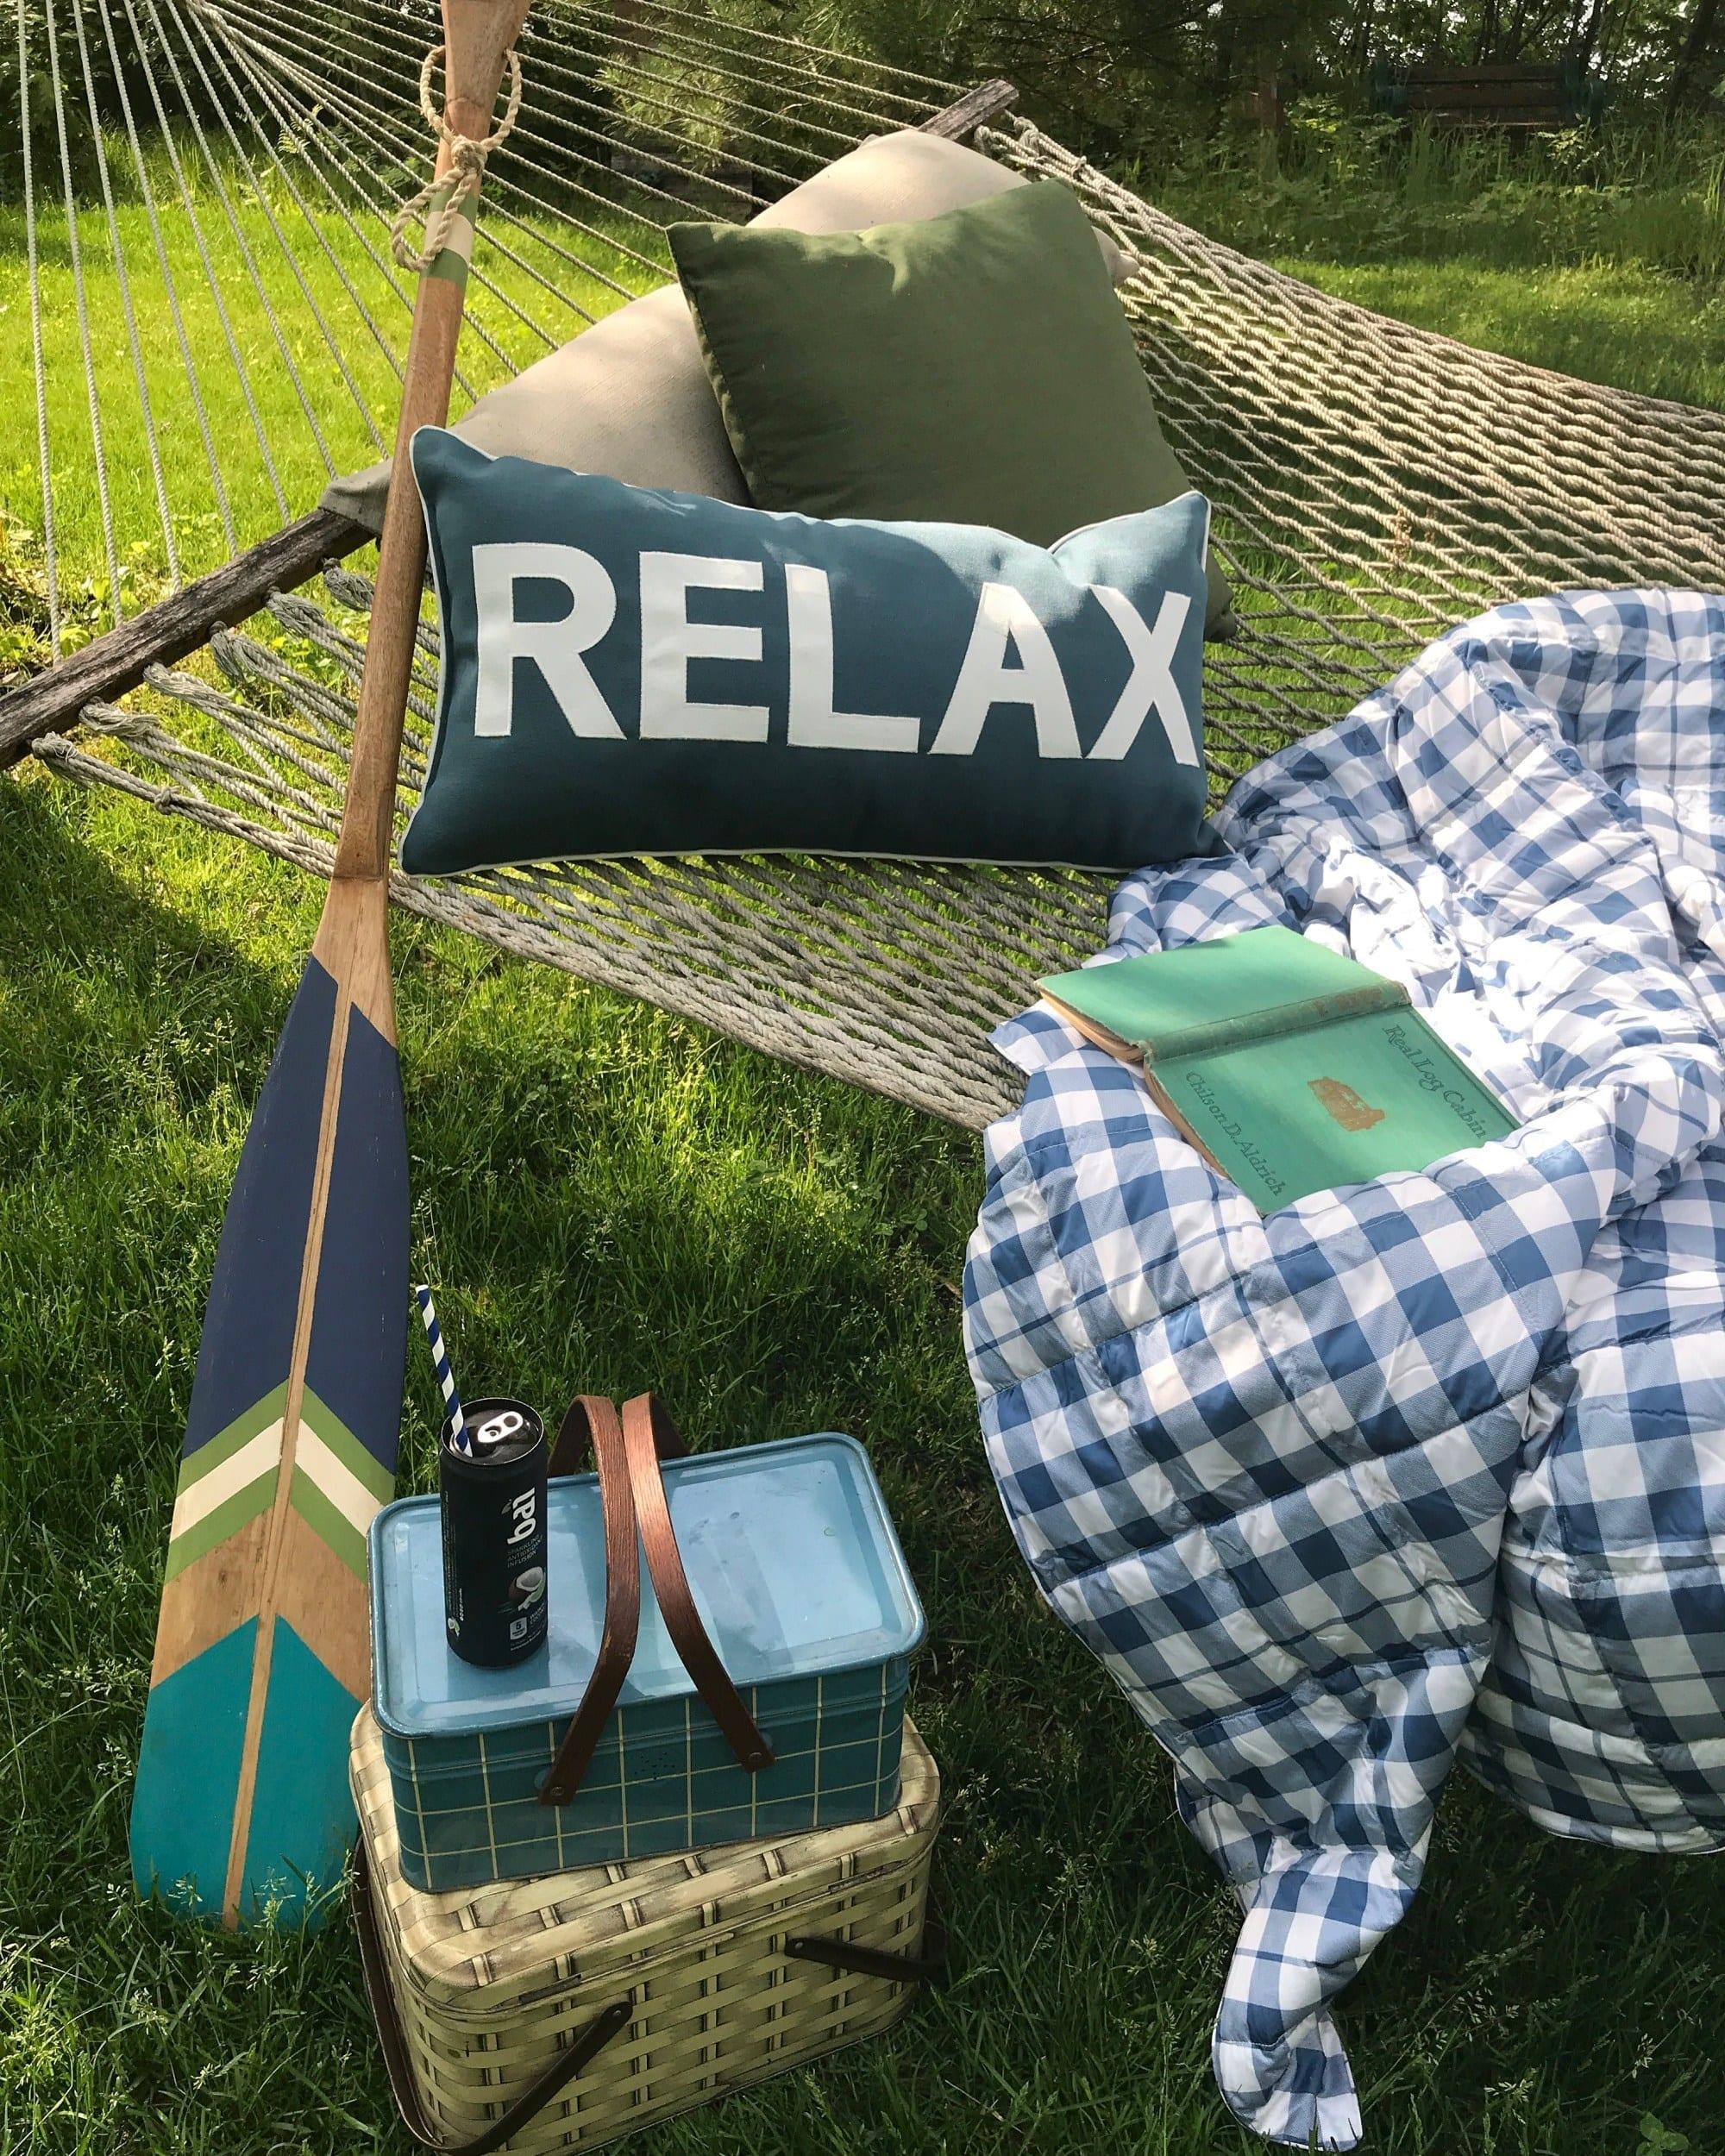 Relax, cozy reading spot